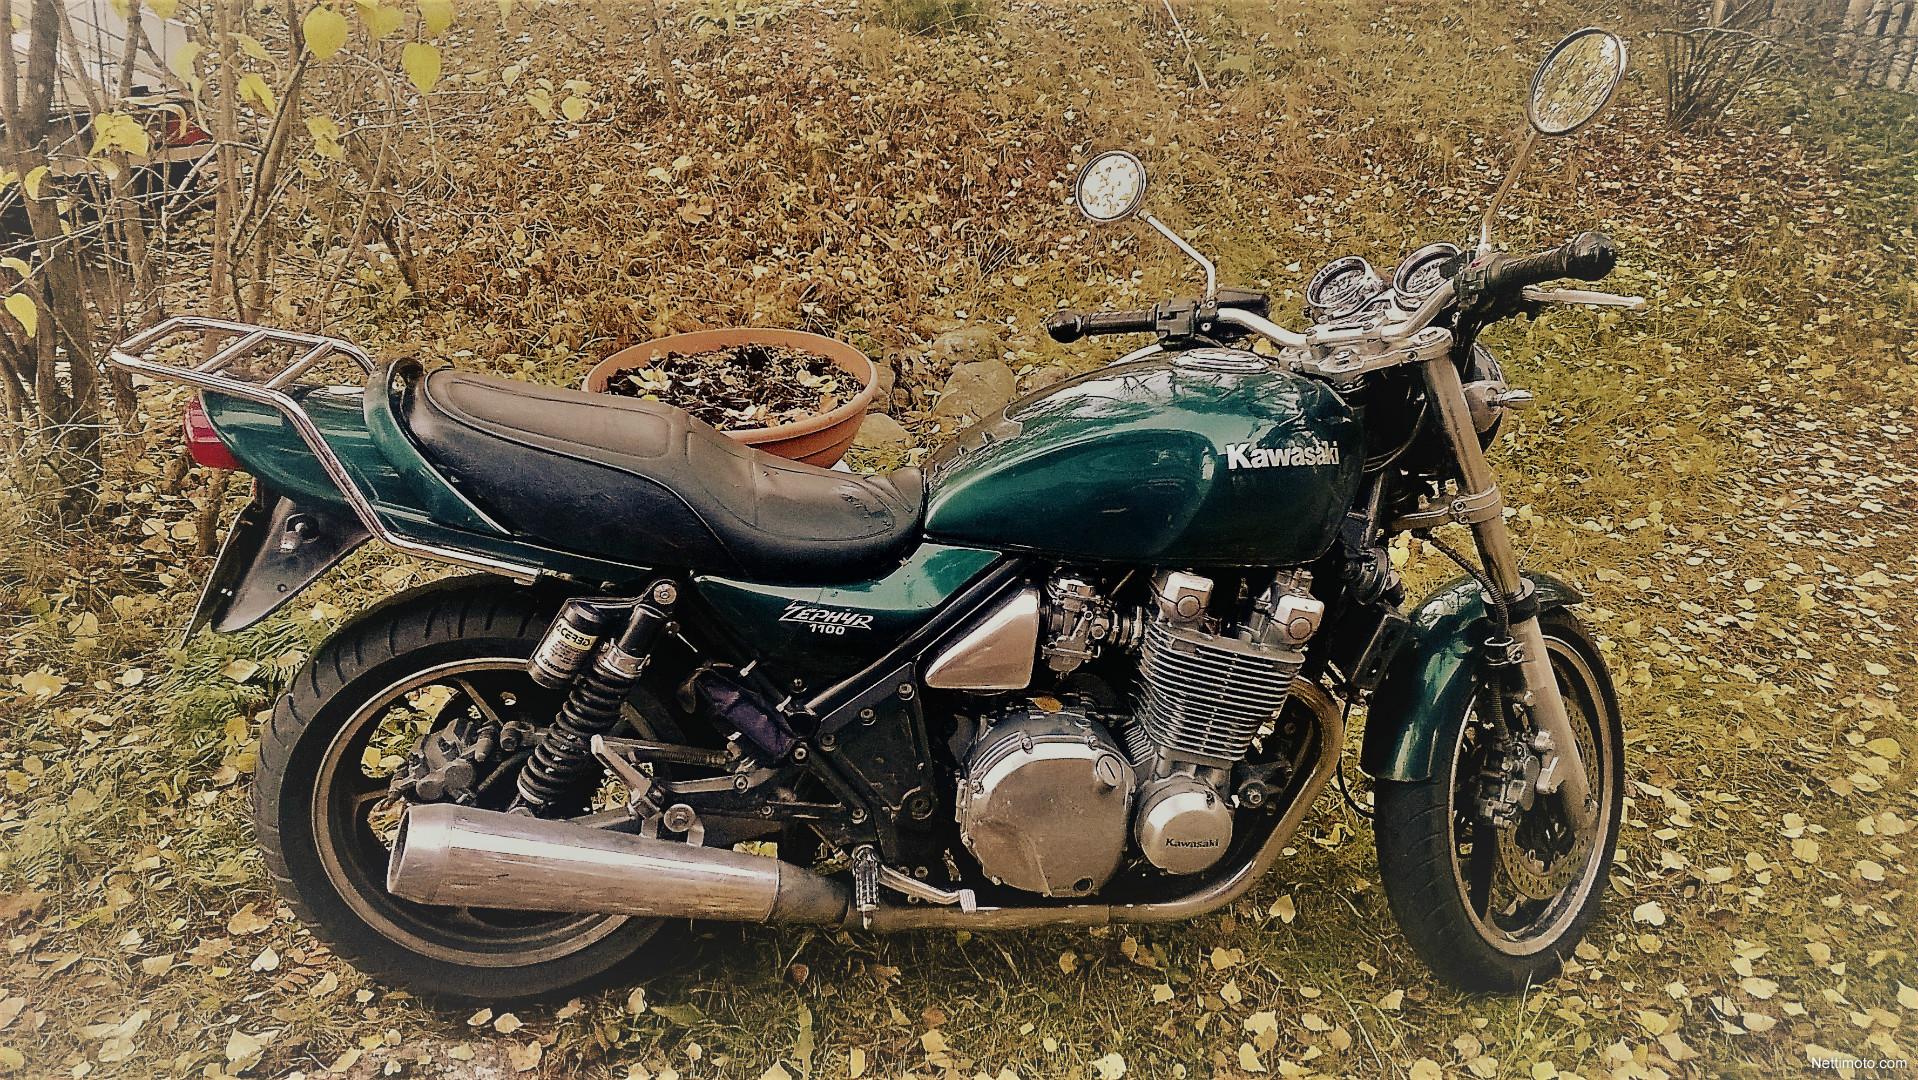 kawasaki zephyr 1100 1 100 cm 1992 tammela motorcycle. Black Bedroom Furniture Sets. Home Design Ideas